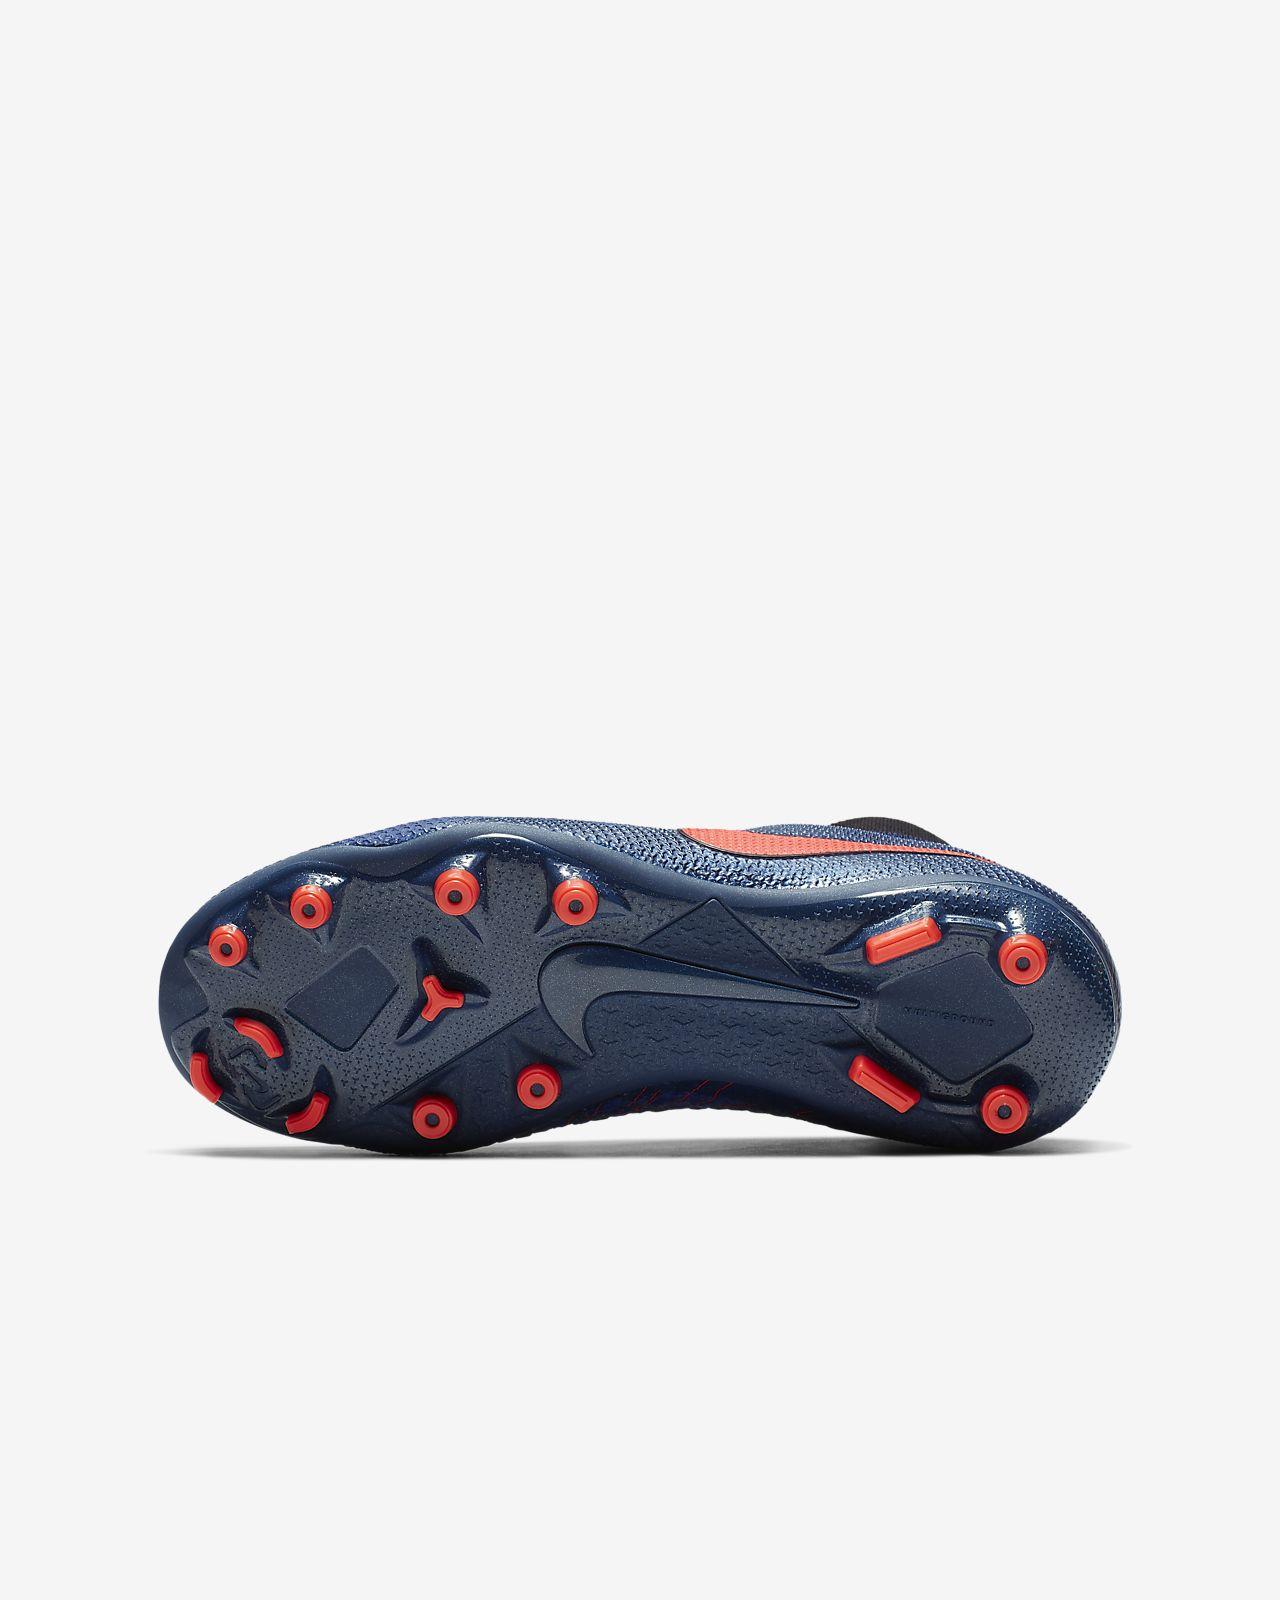 8437b5614 ... Nike Jr. Phantom Vision Elite Dynamic Fit MG Older Kids  Multi-Ground  Football